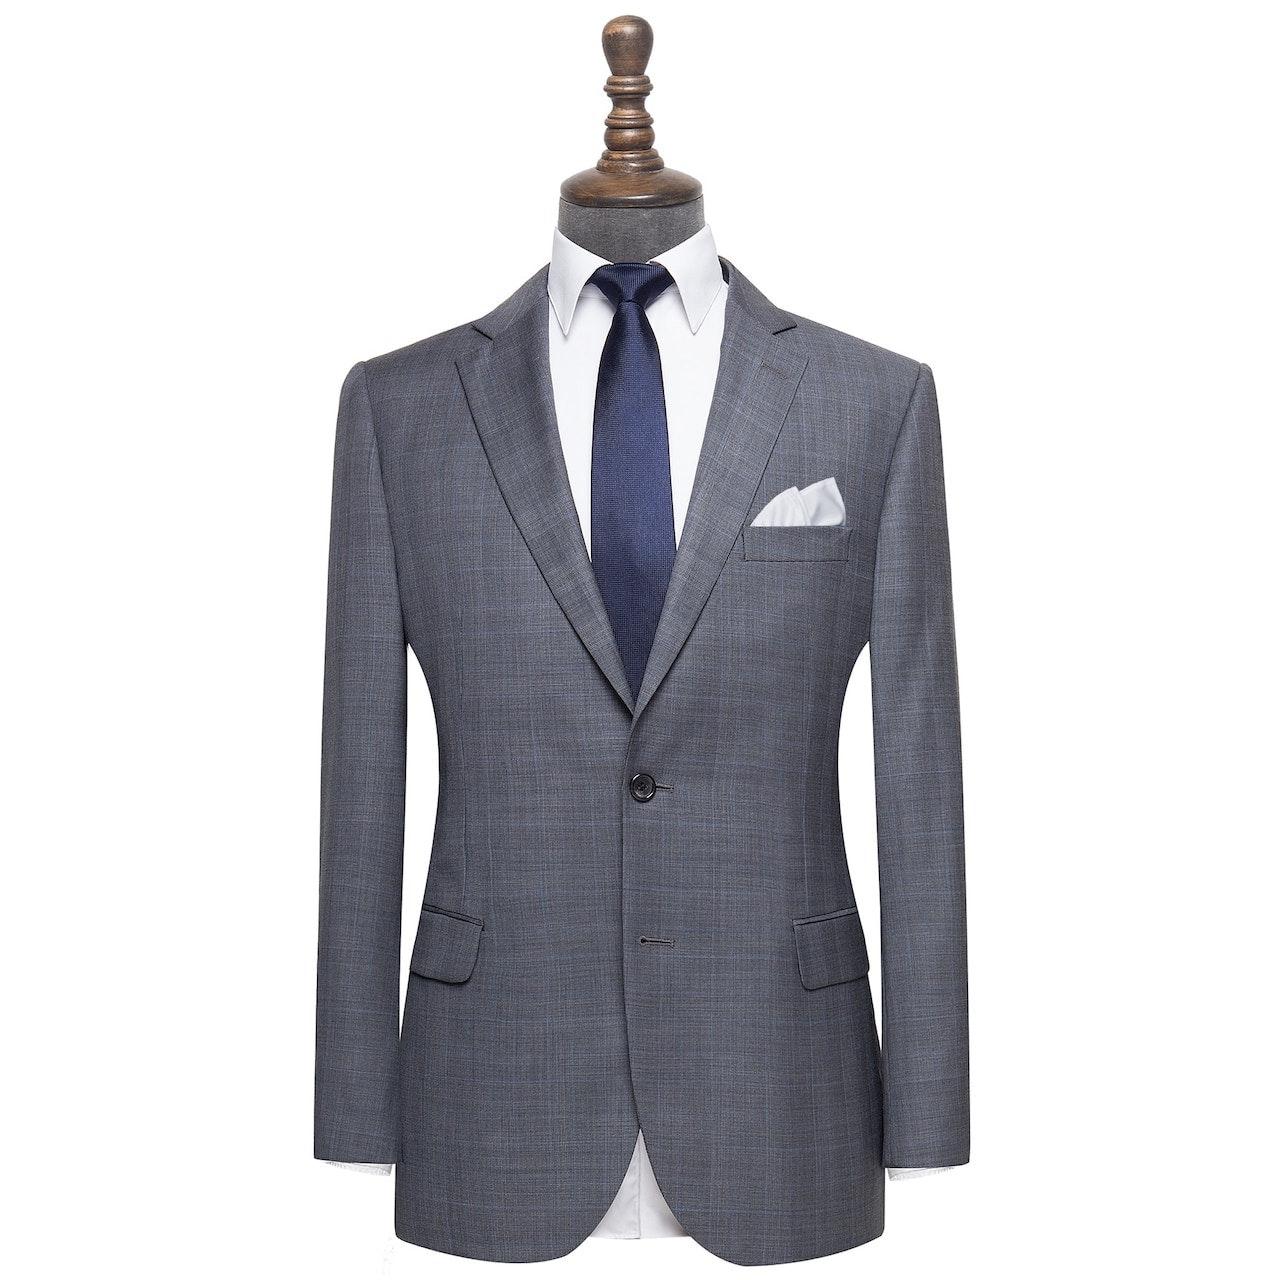 InStitchu Suit Fabric 102